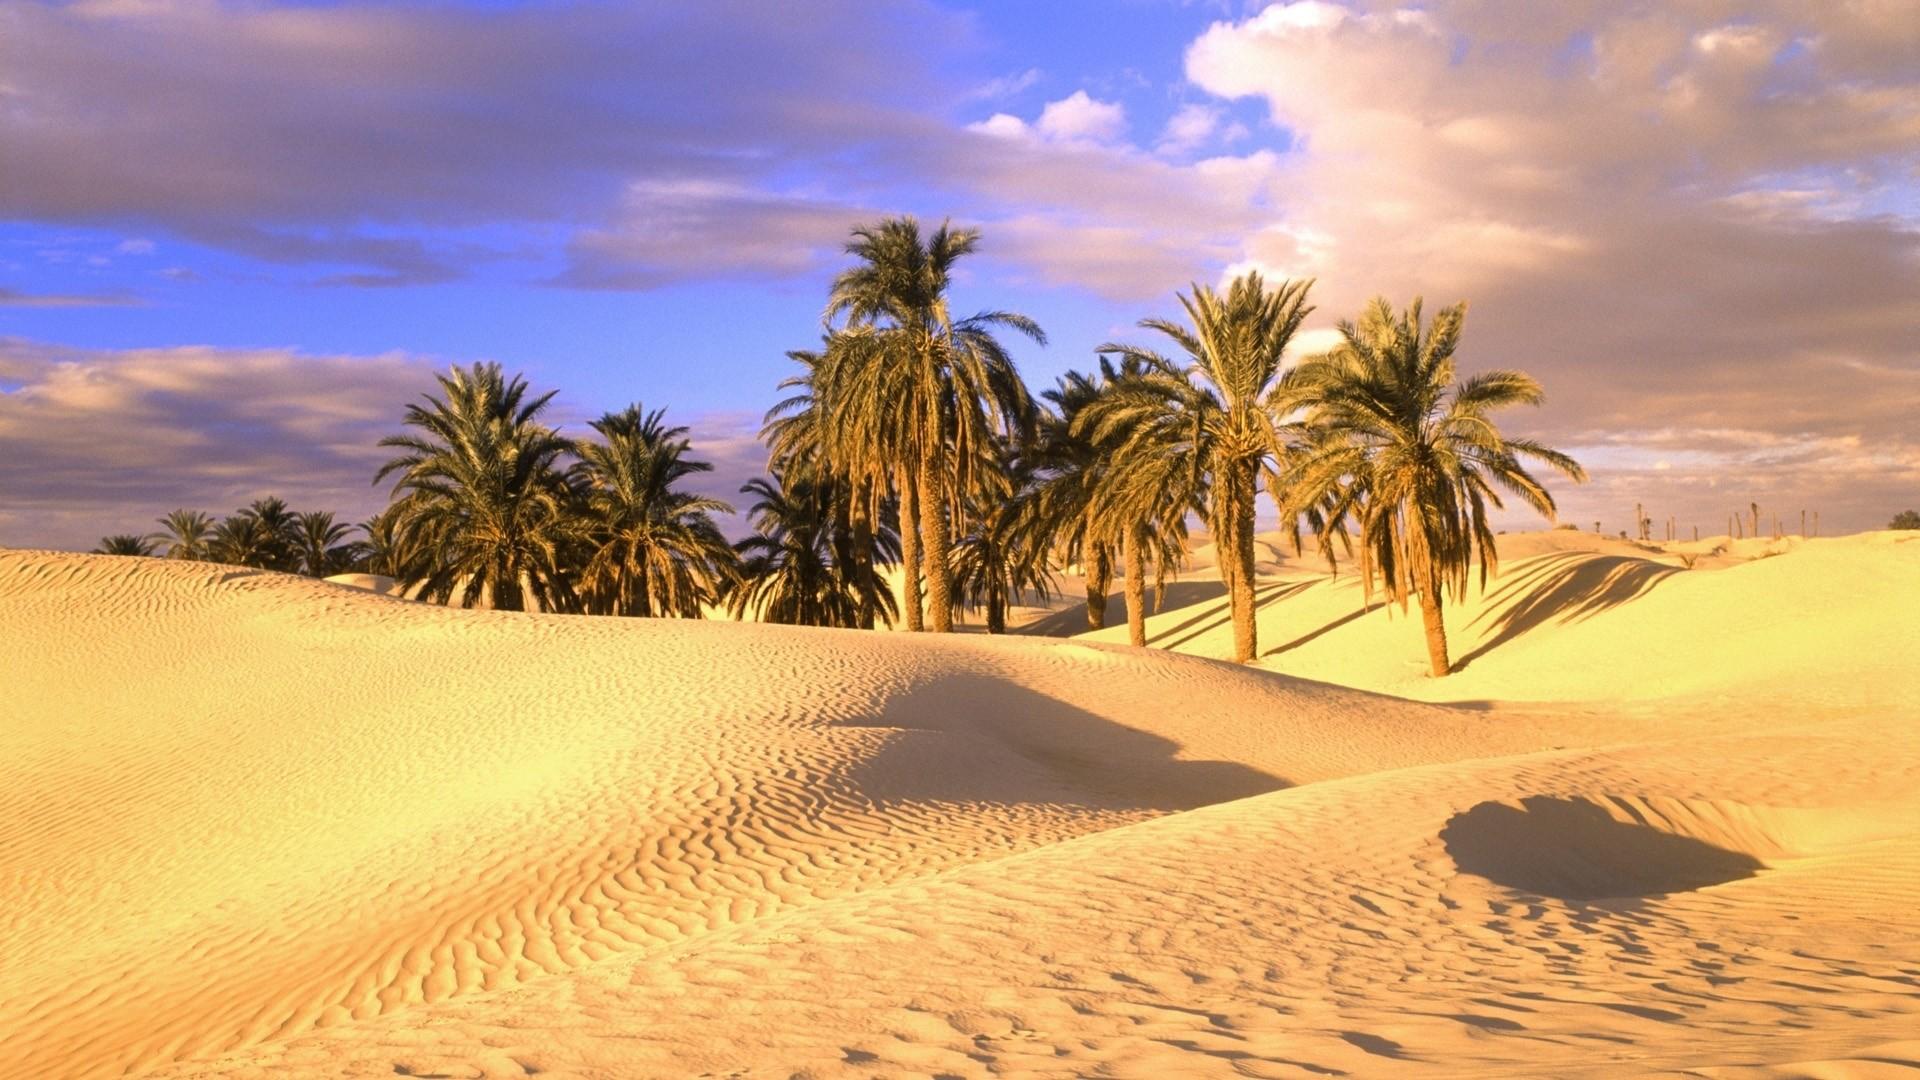 palm tree wallpaper pack 1080p hd